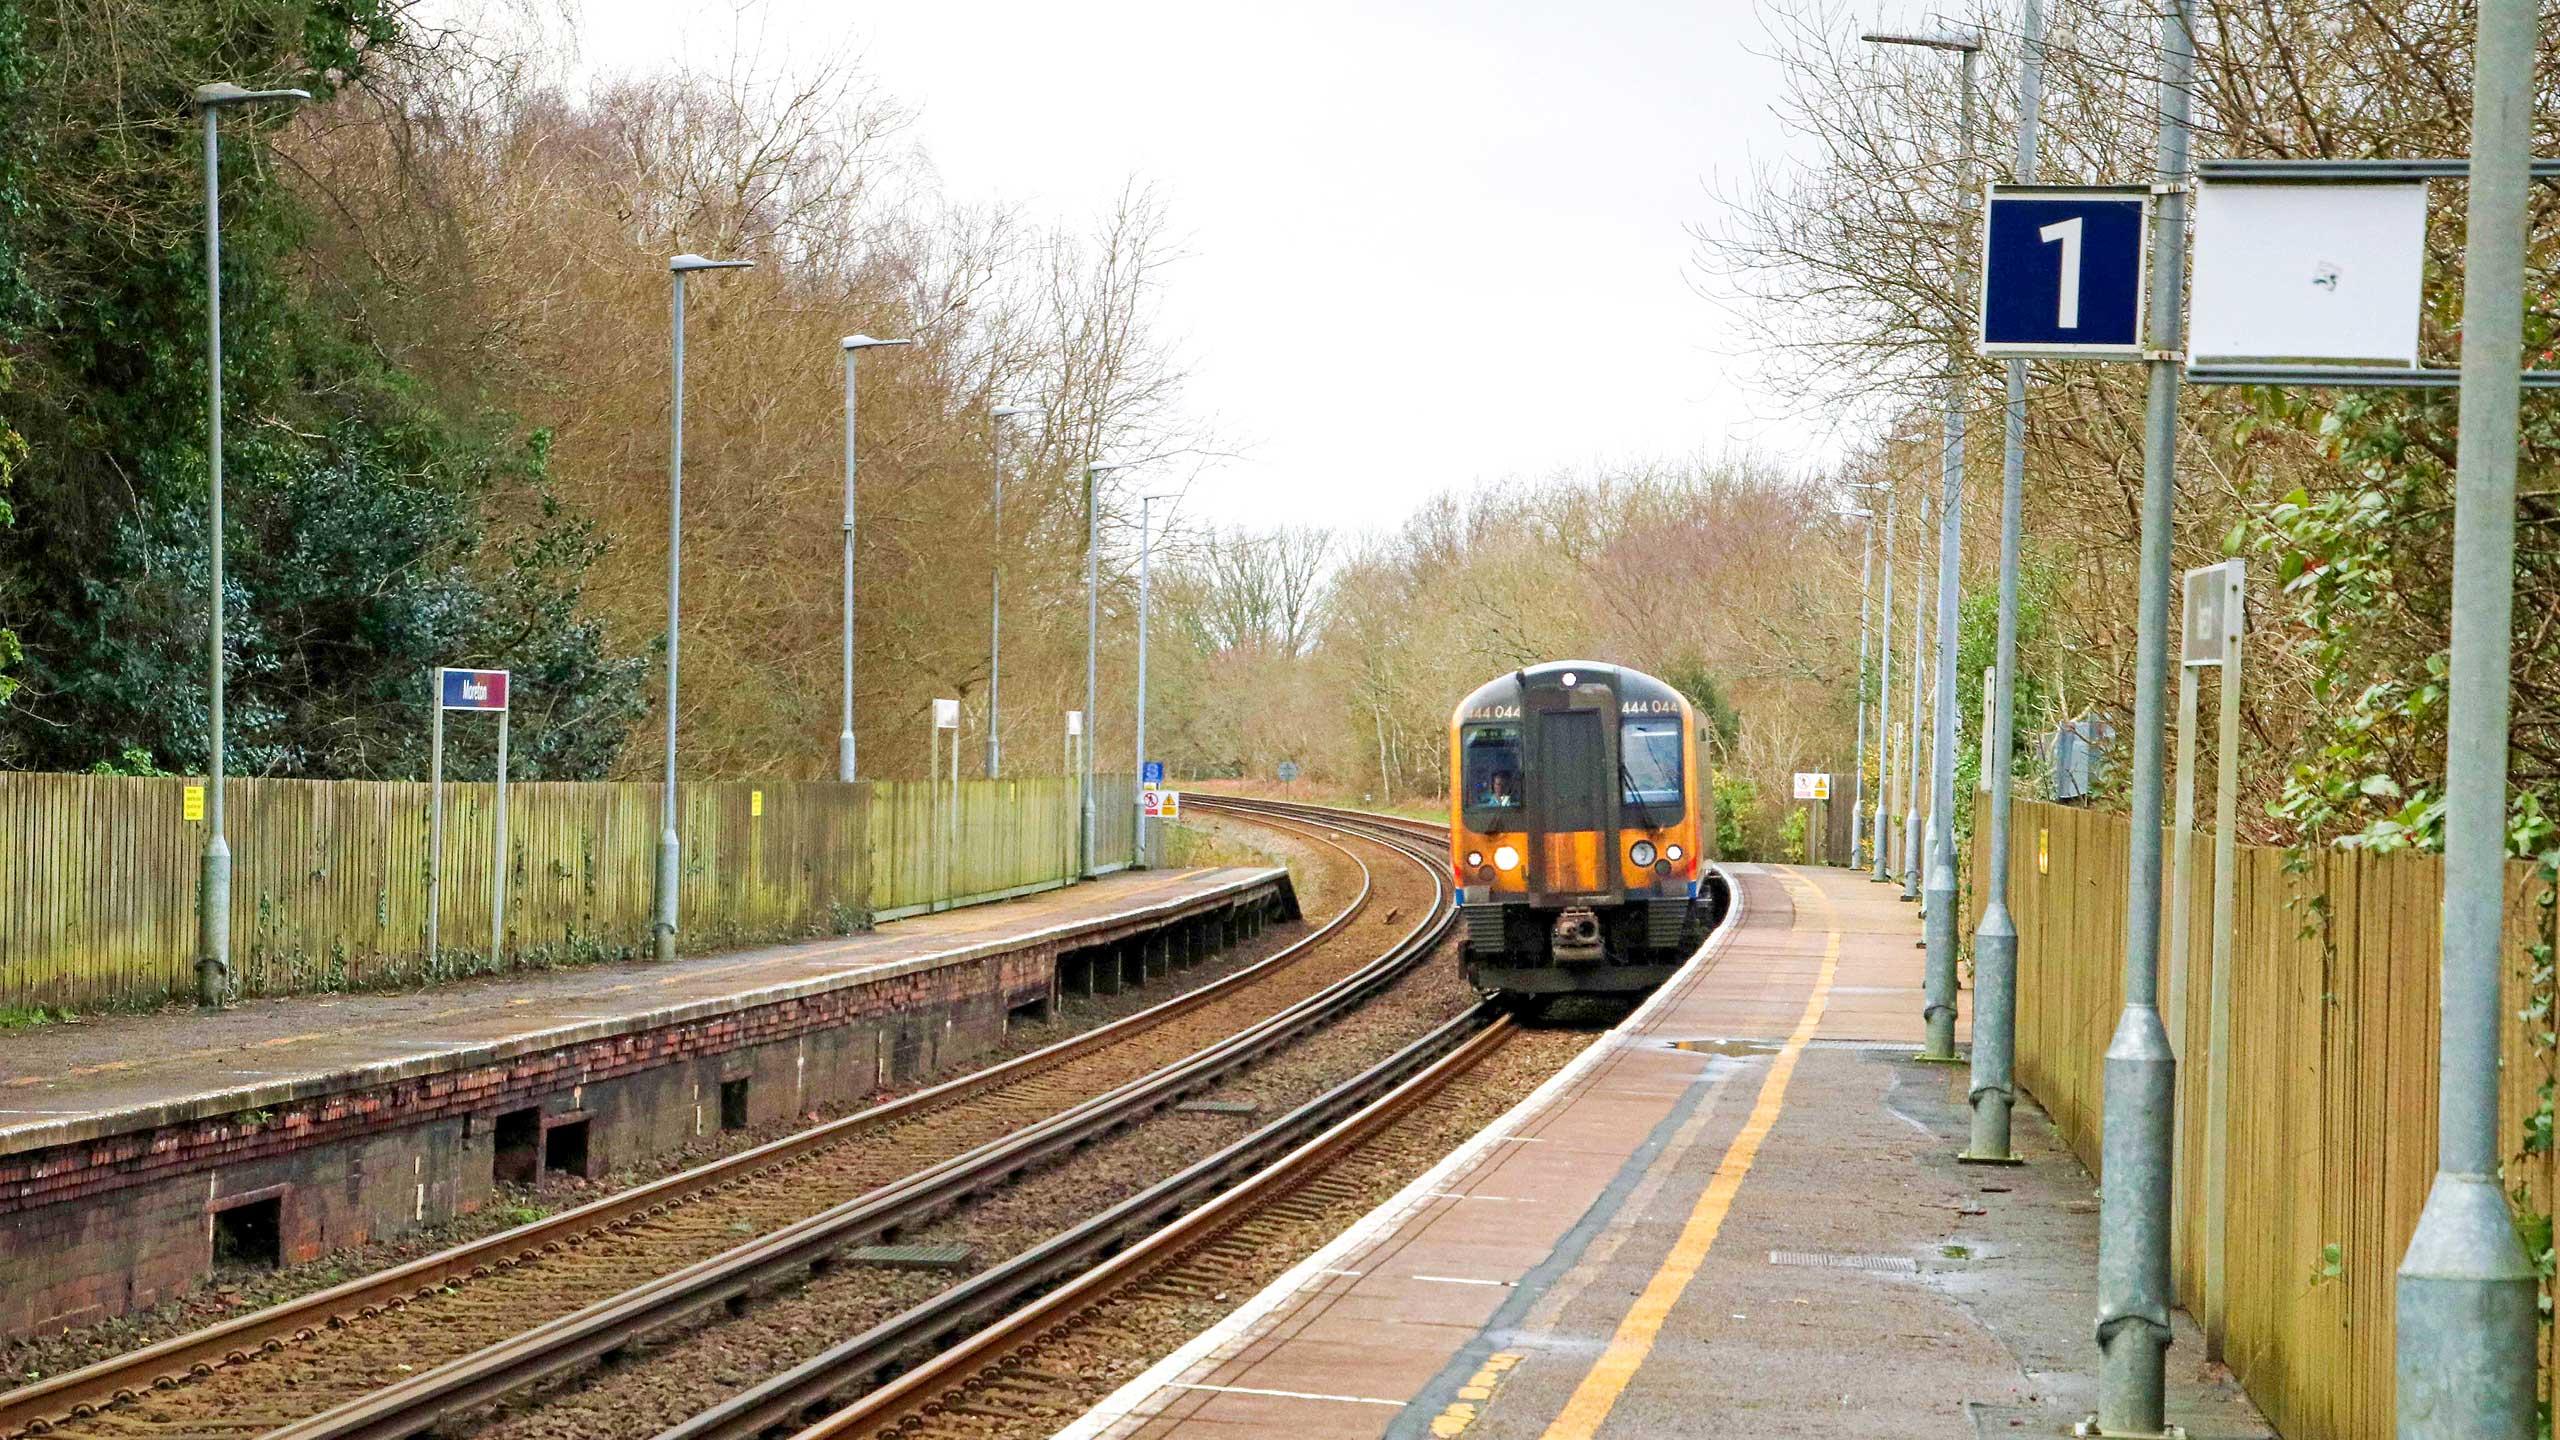 Purbeck Community Rail Partnership Sliding Banner Moreton Railway Station 01 2560x1440px